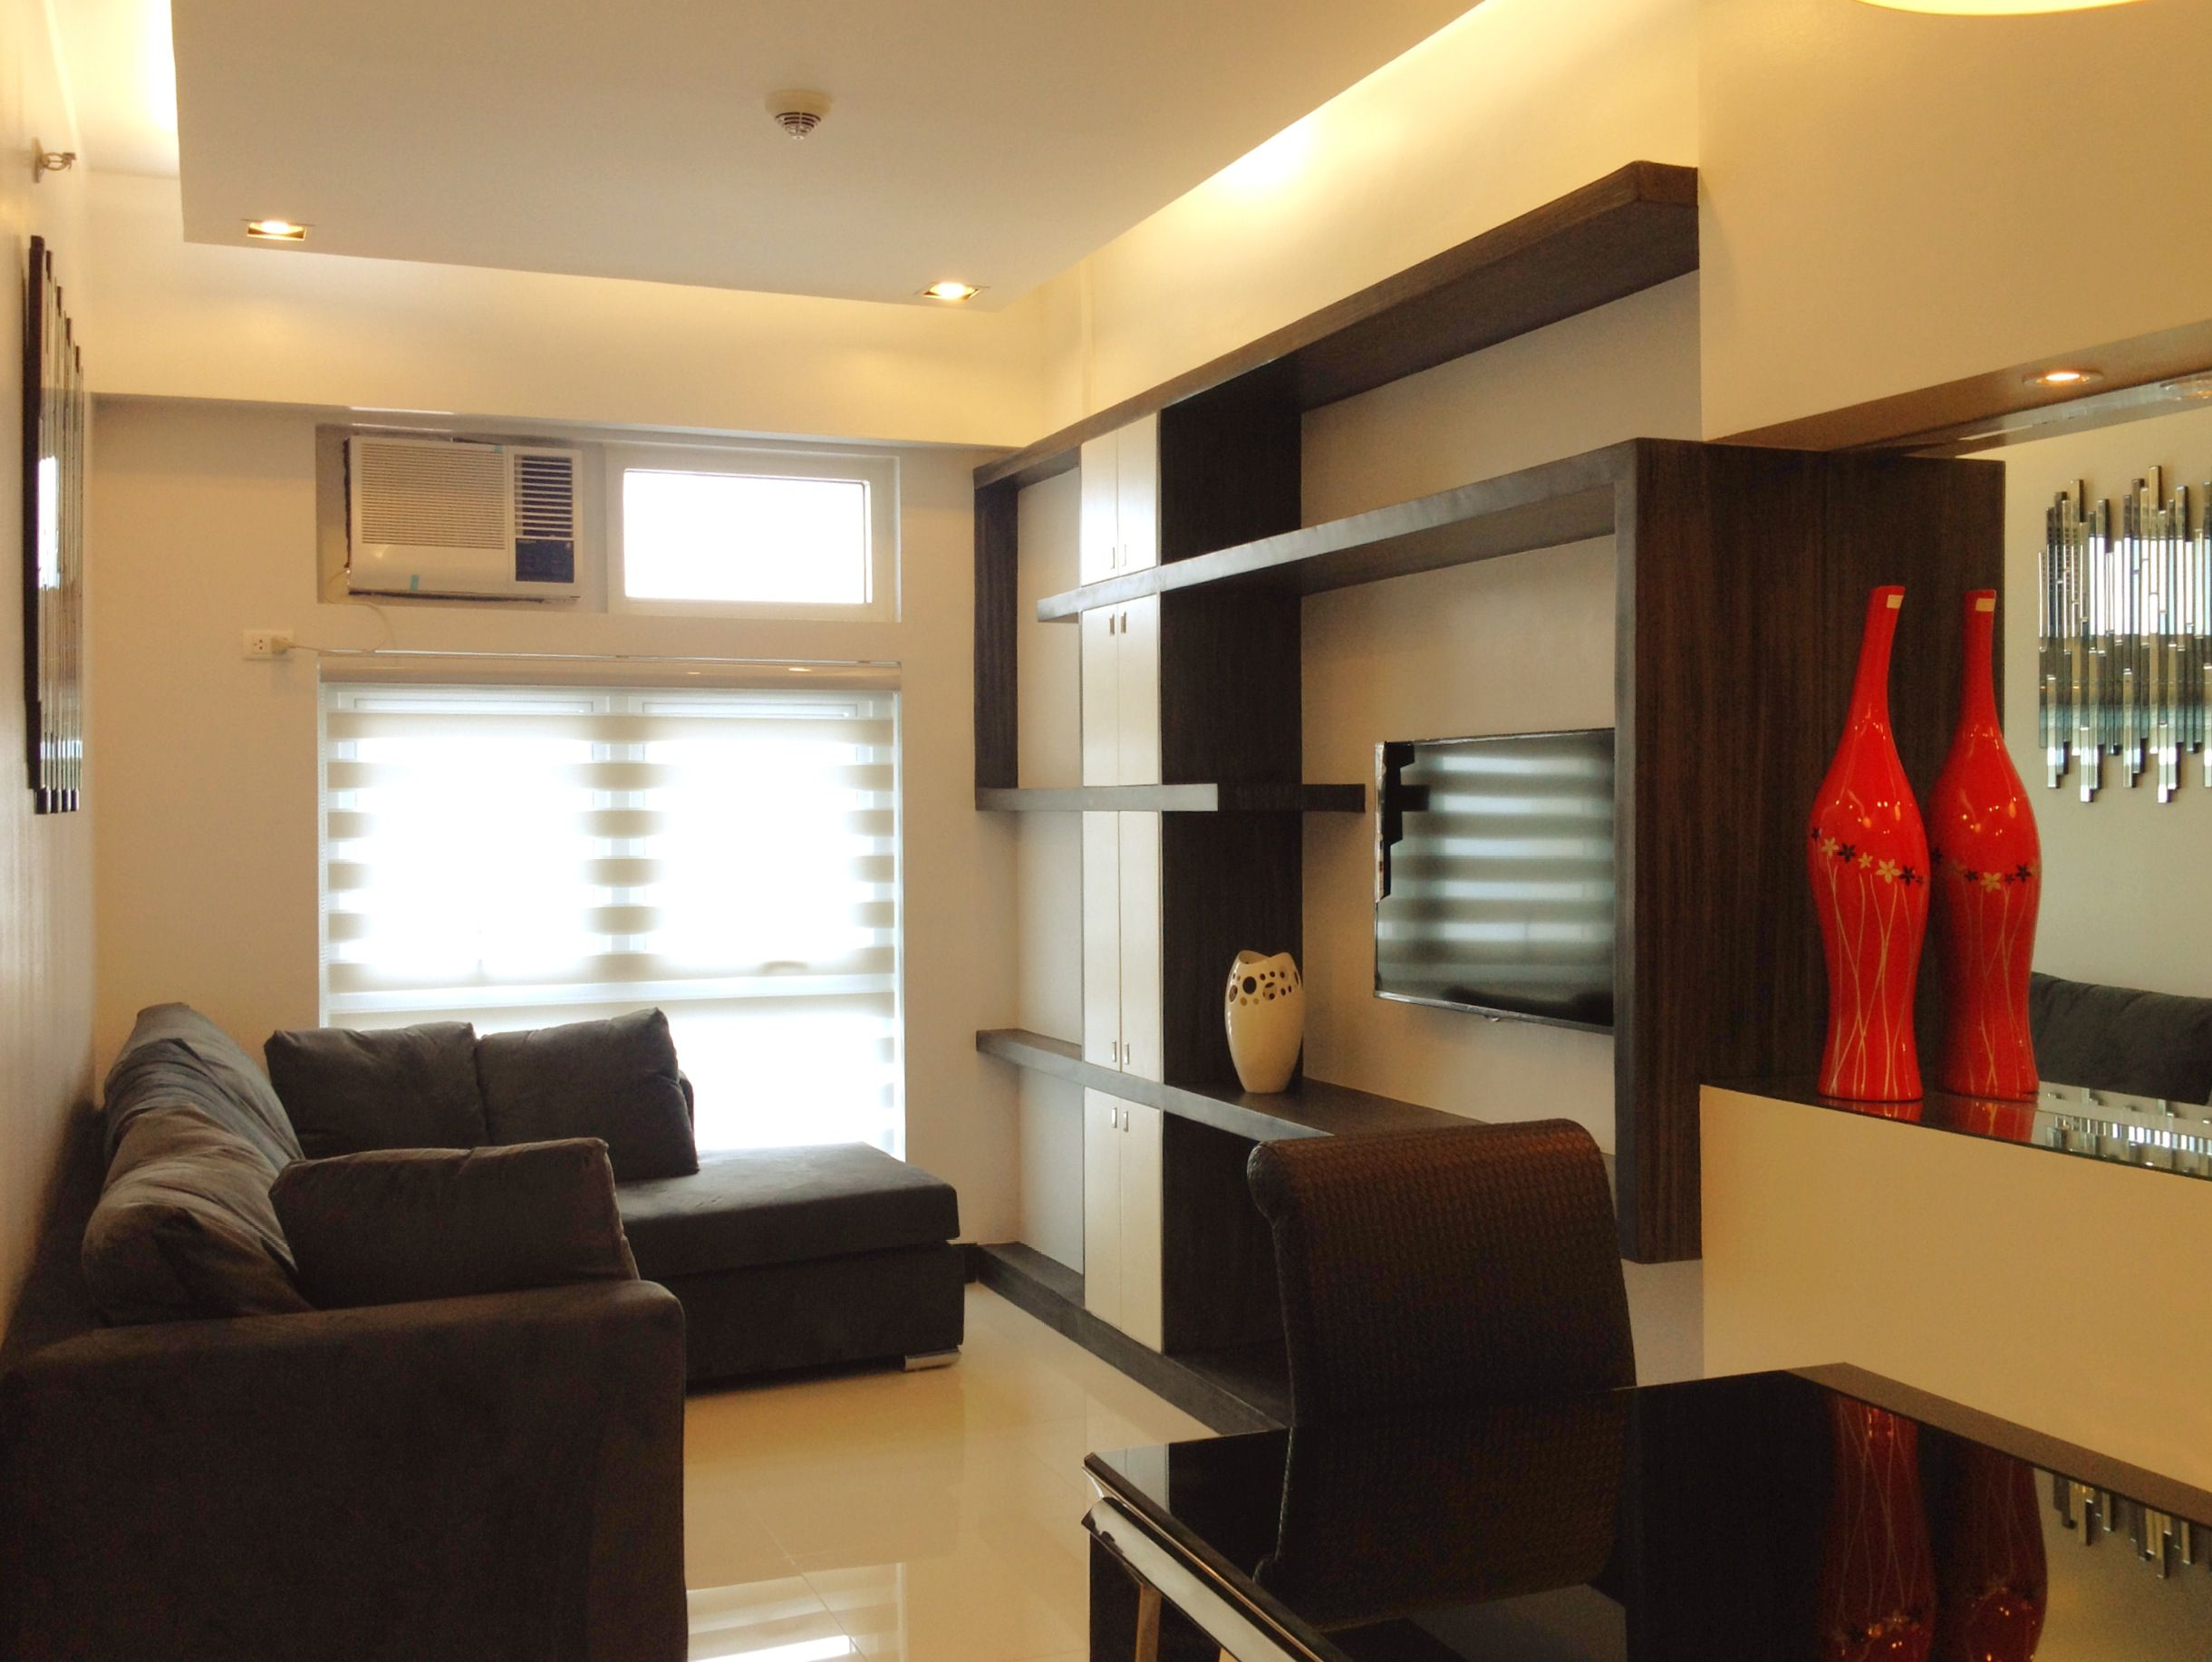 40sqm Condo Unit Living Room Design Small Spaces Interior Design Apartment Small Apartment Interior Design